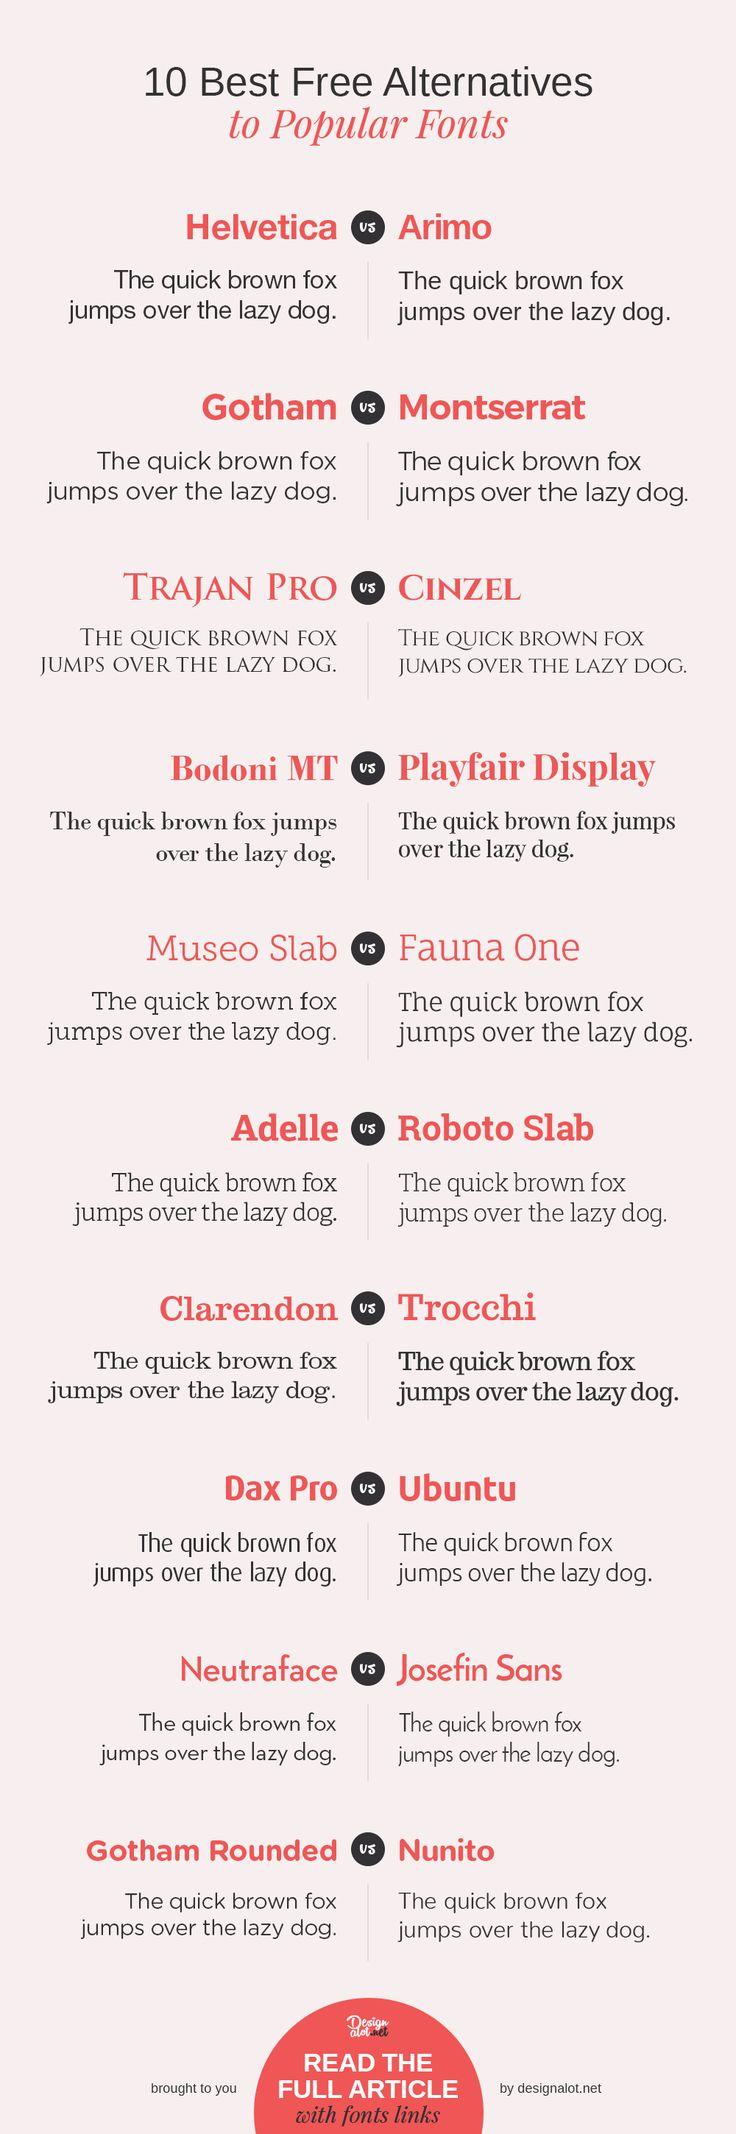 10 Best Free Alternatives to Popular Fonts #fonts #freebies #freefonts #free #fontreplacements #alternatives #design #typography #graphics #graphicdesign #sansserif #serif #didot #slabserif #geometrical